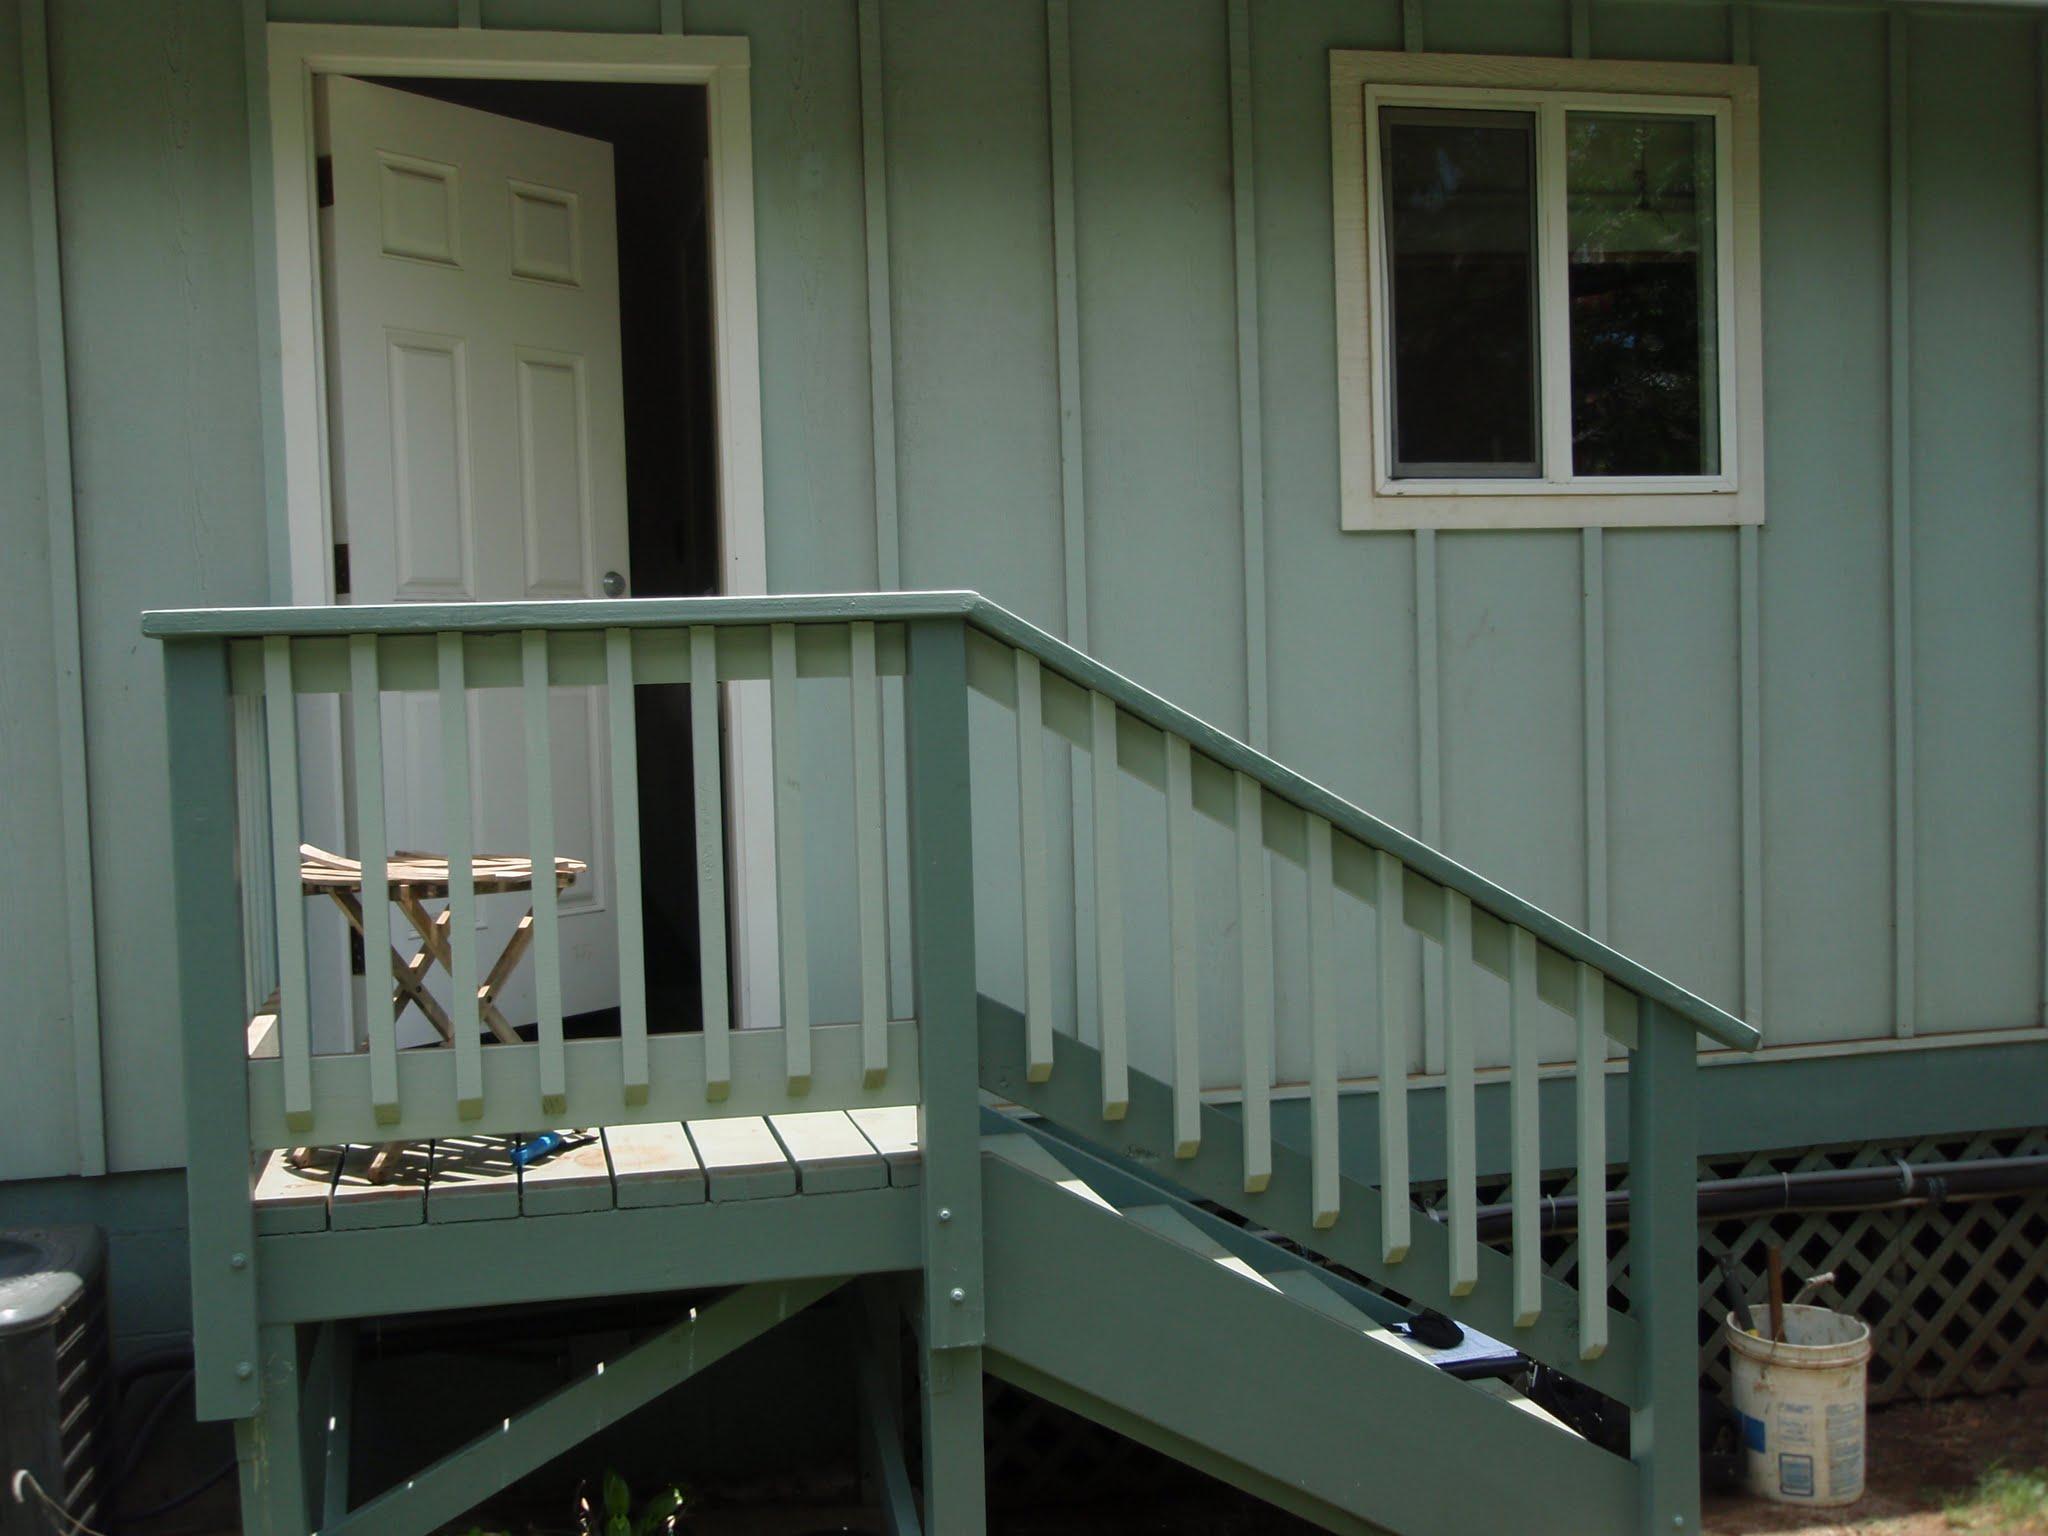 Net back door from garage to rear yard